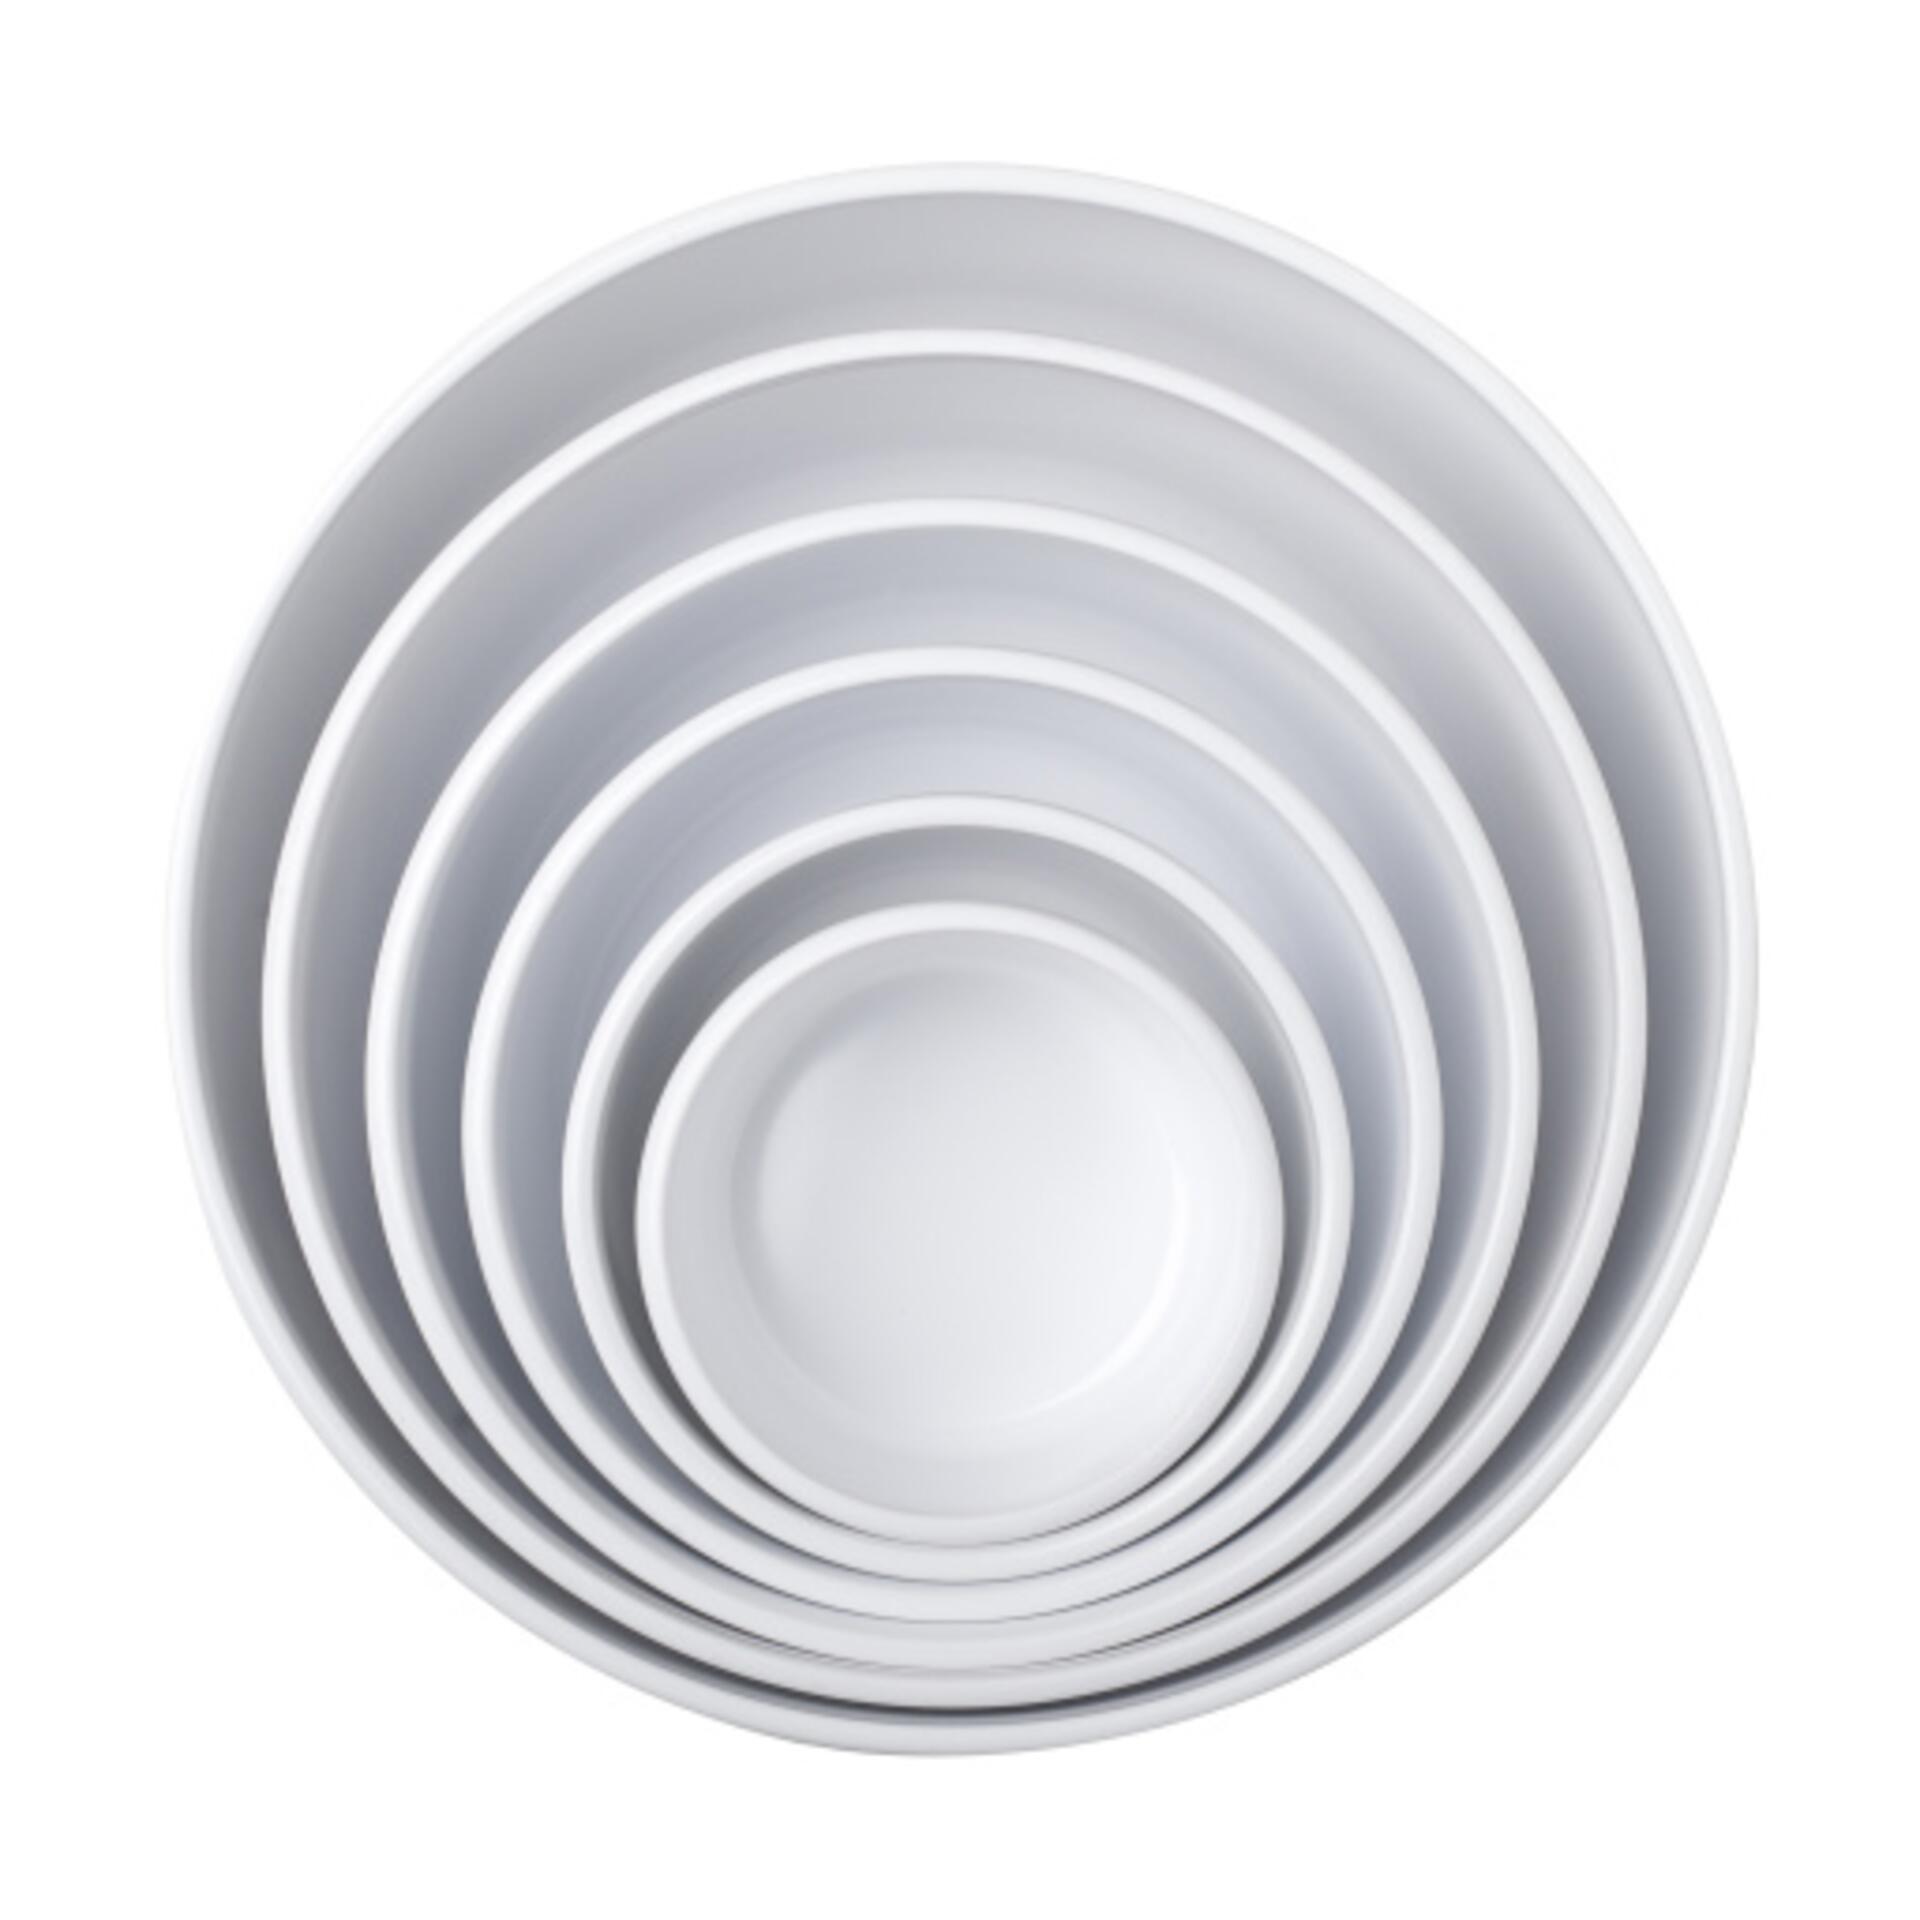 Rosti Mepal Volumia Aufbewahrung 1,0 l Grau